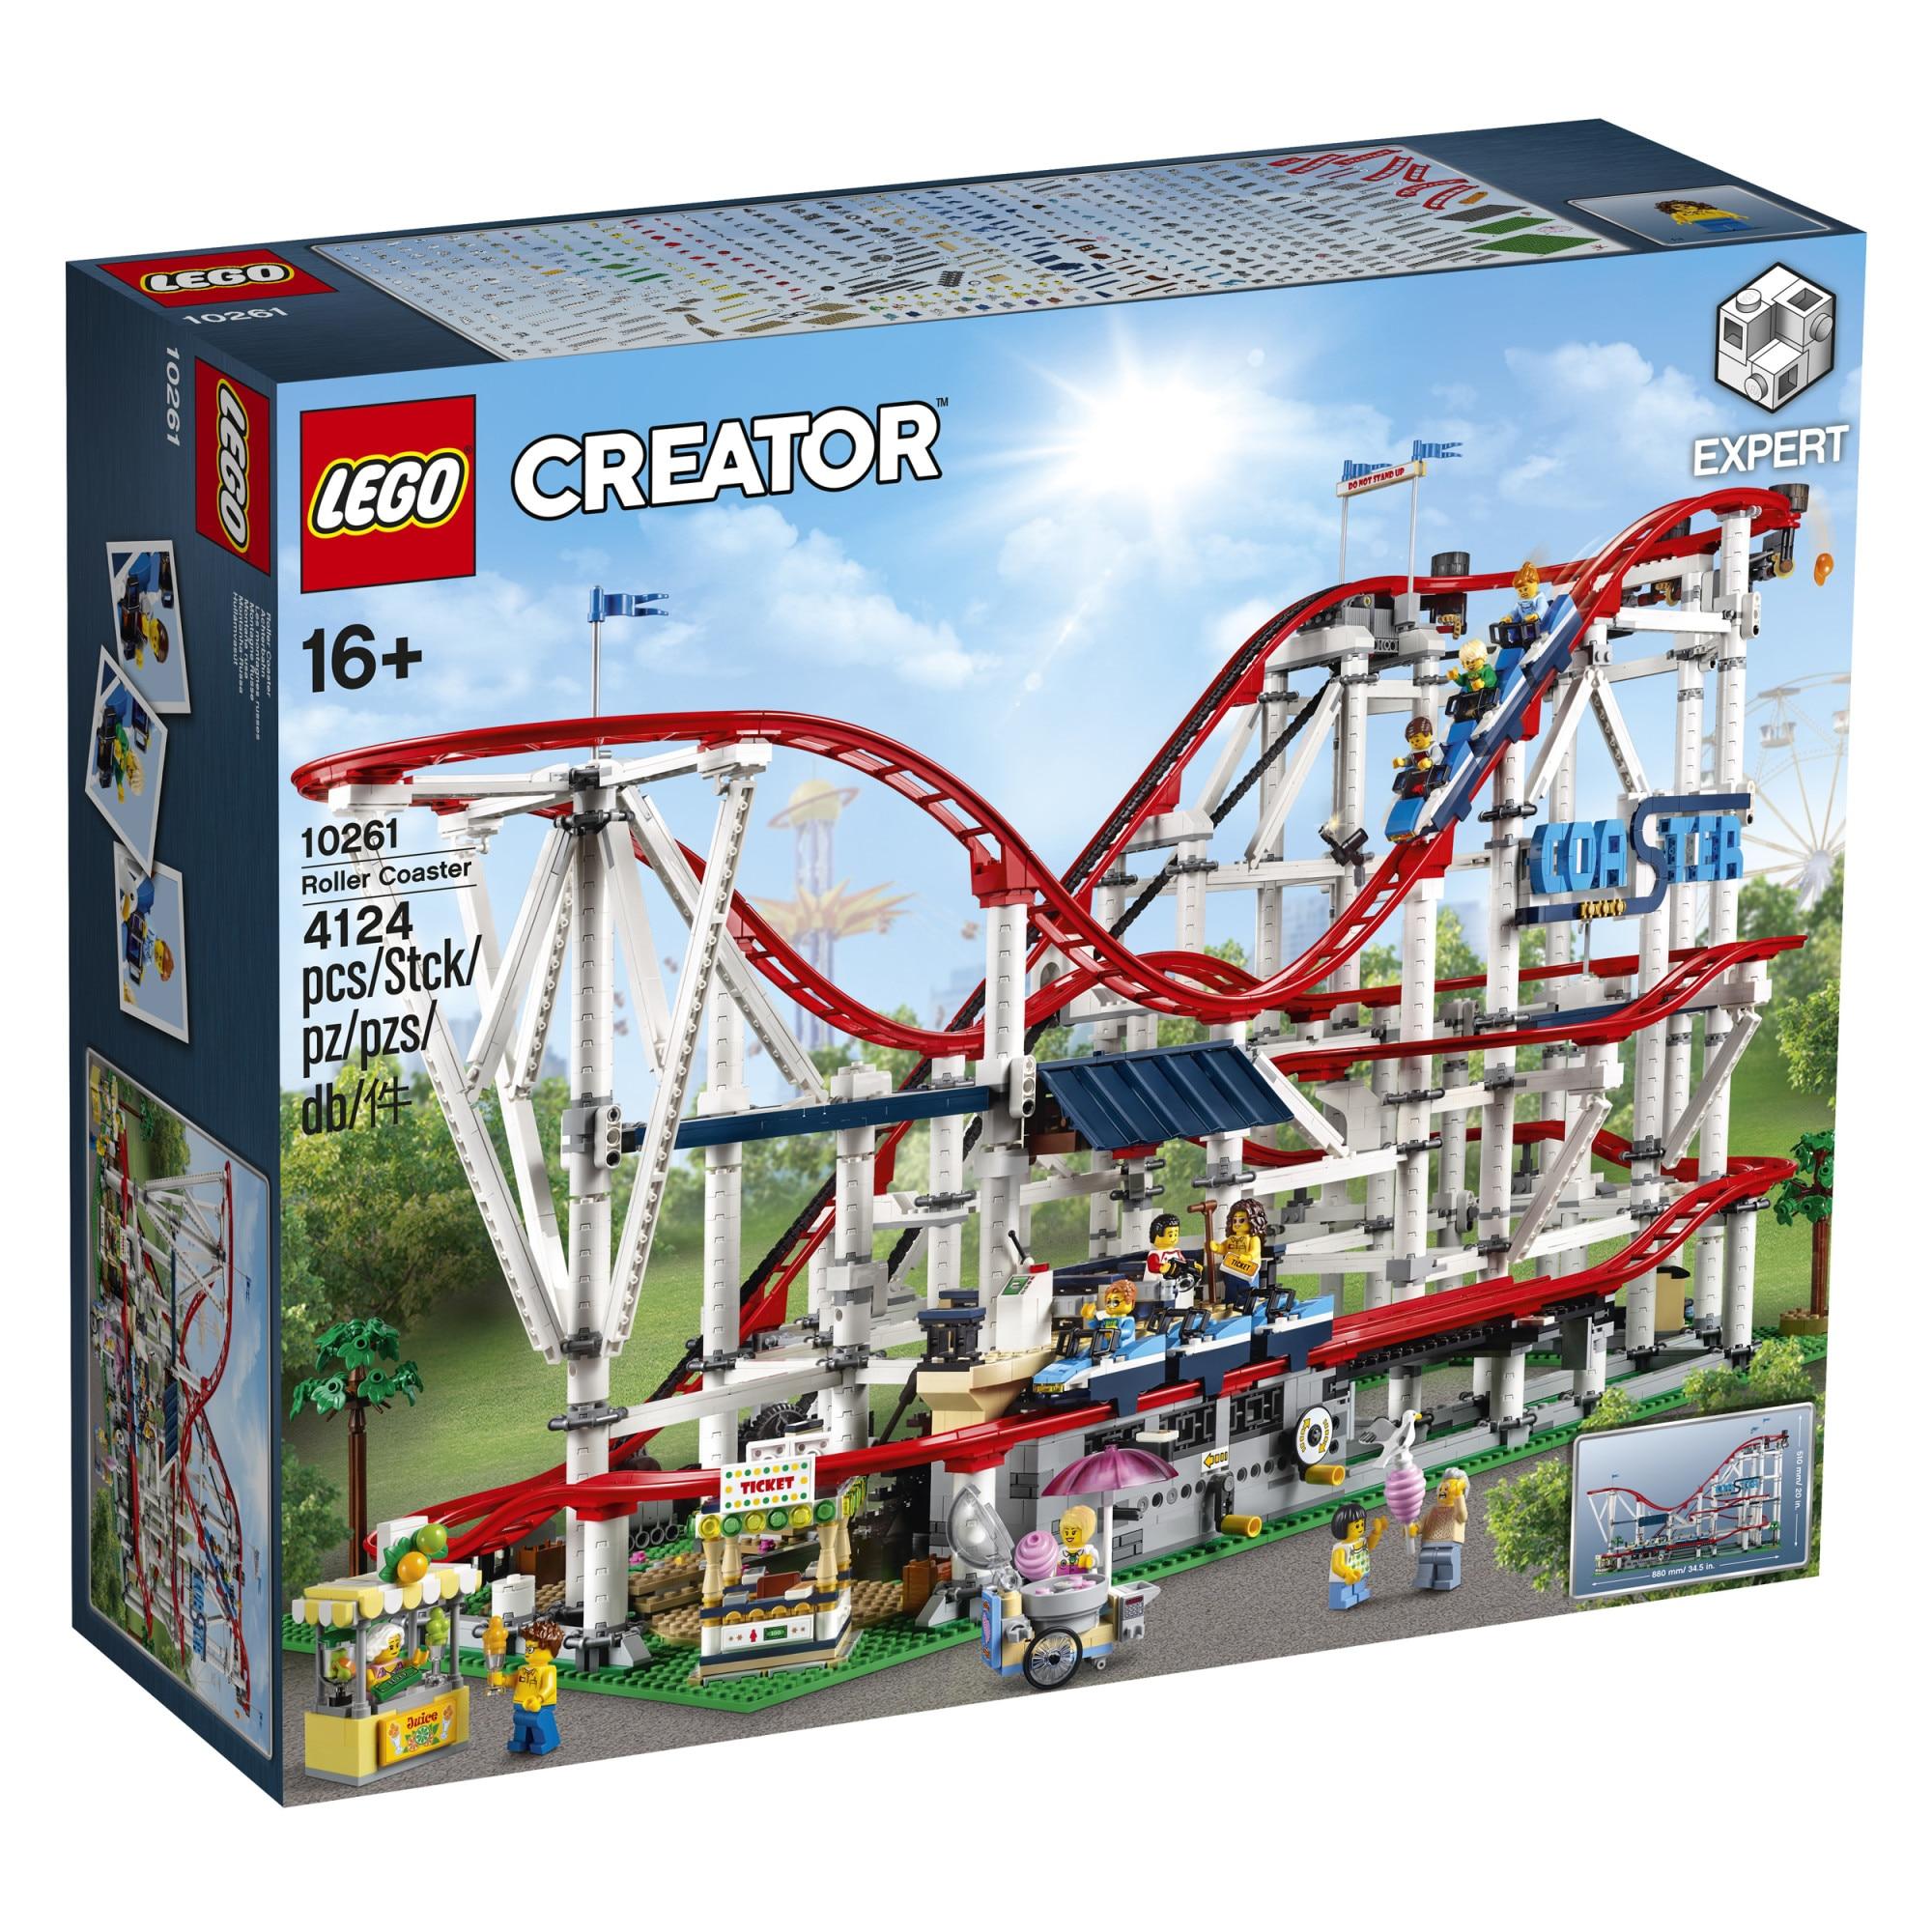 Fotografie LEGO Creator Expert - Roller Coaster 10261